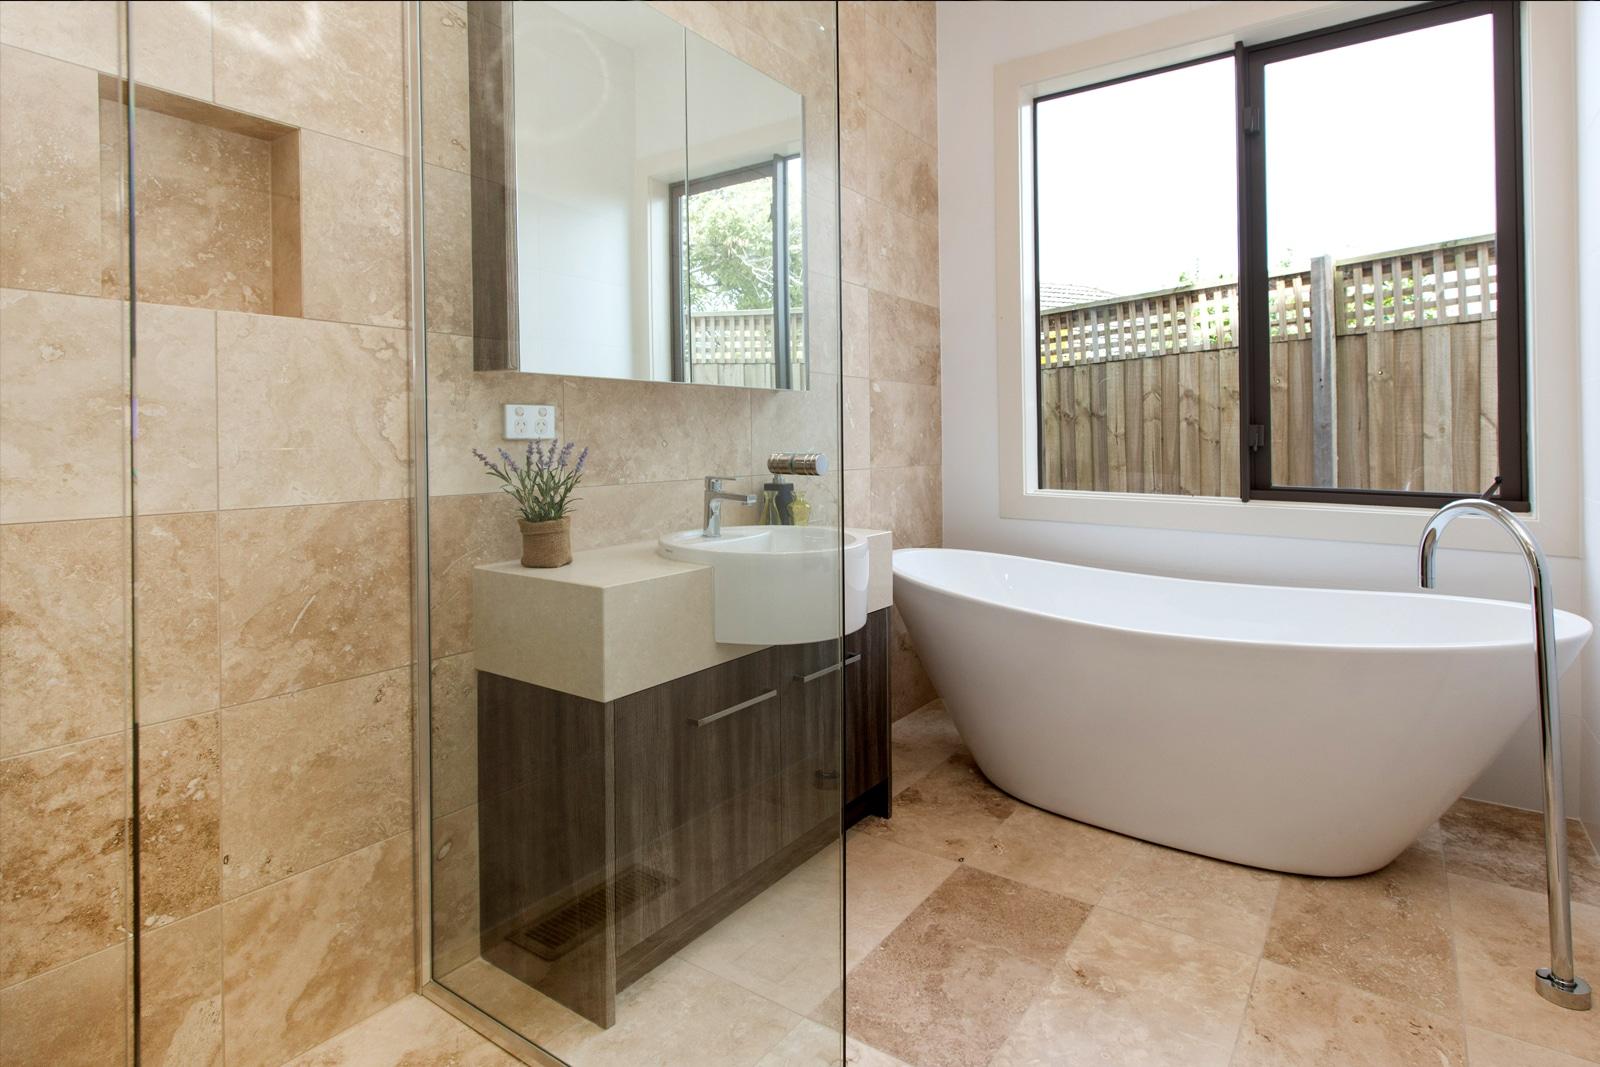 sandstone - Westcountry Tile & Bathroom